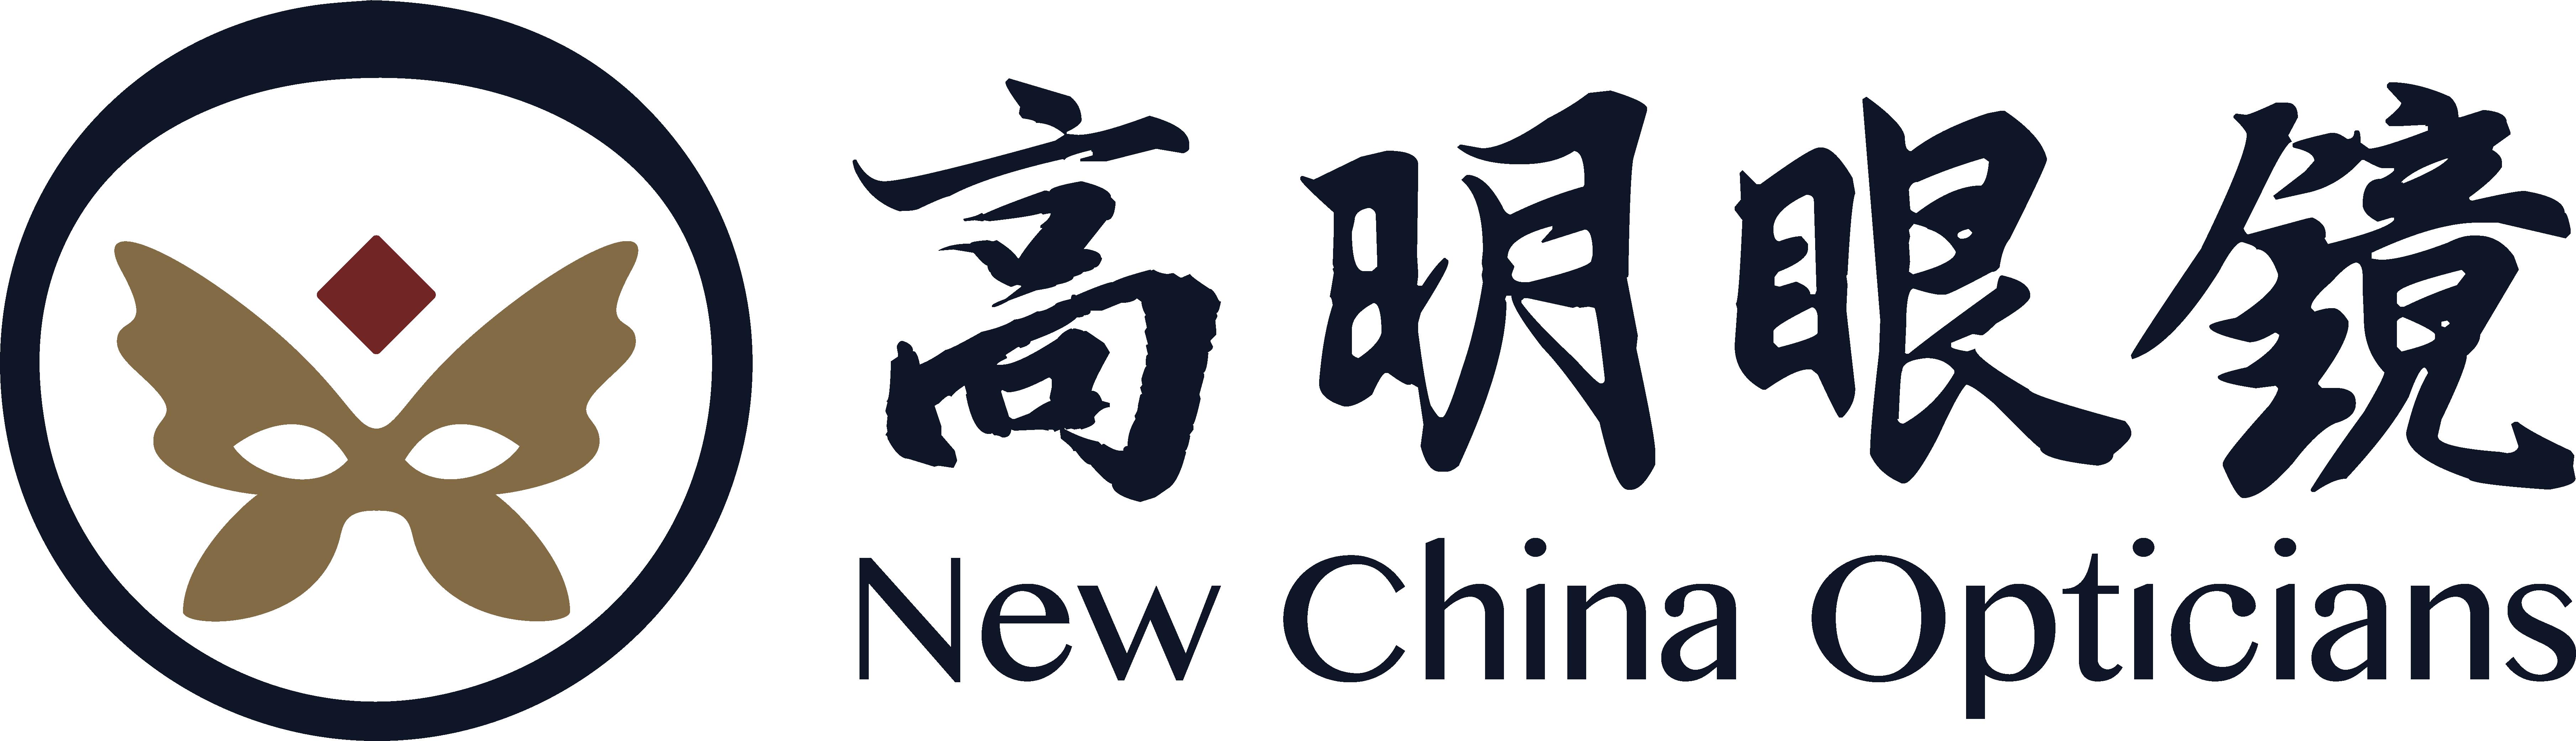 New China Opticians